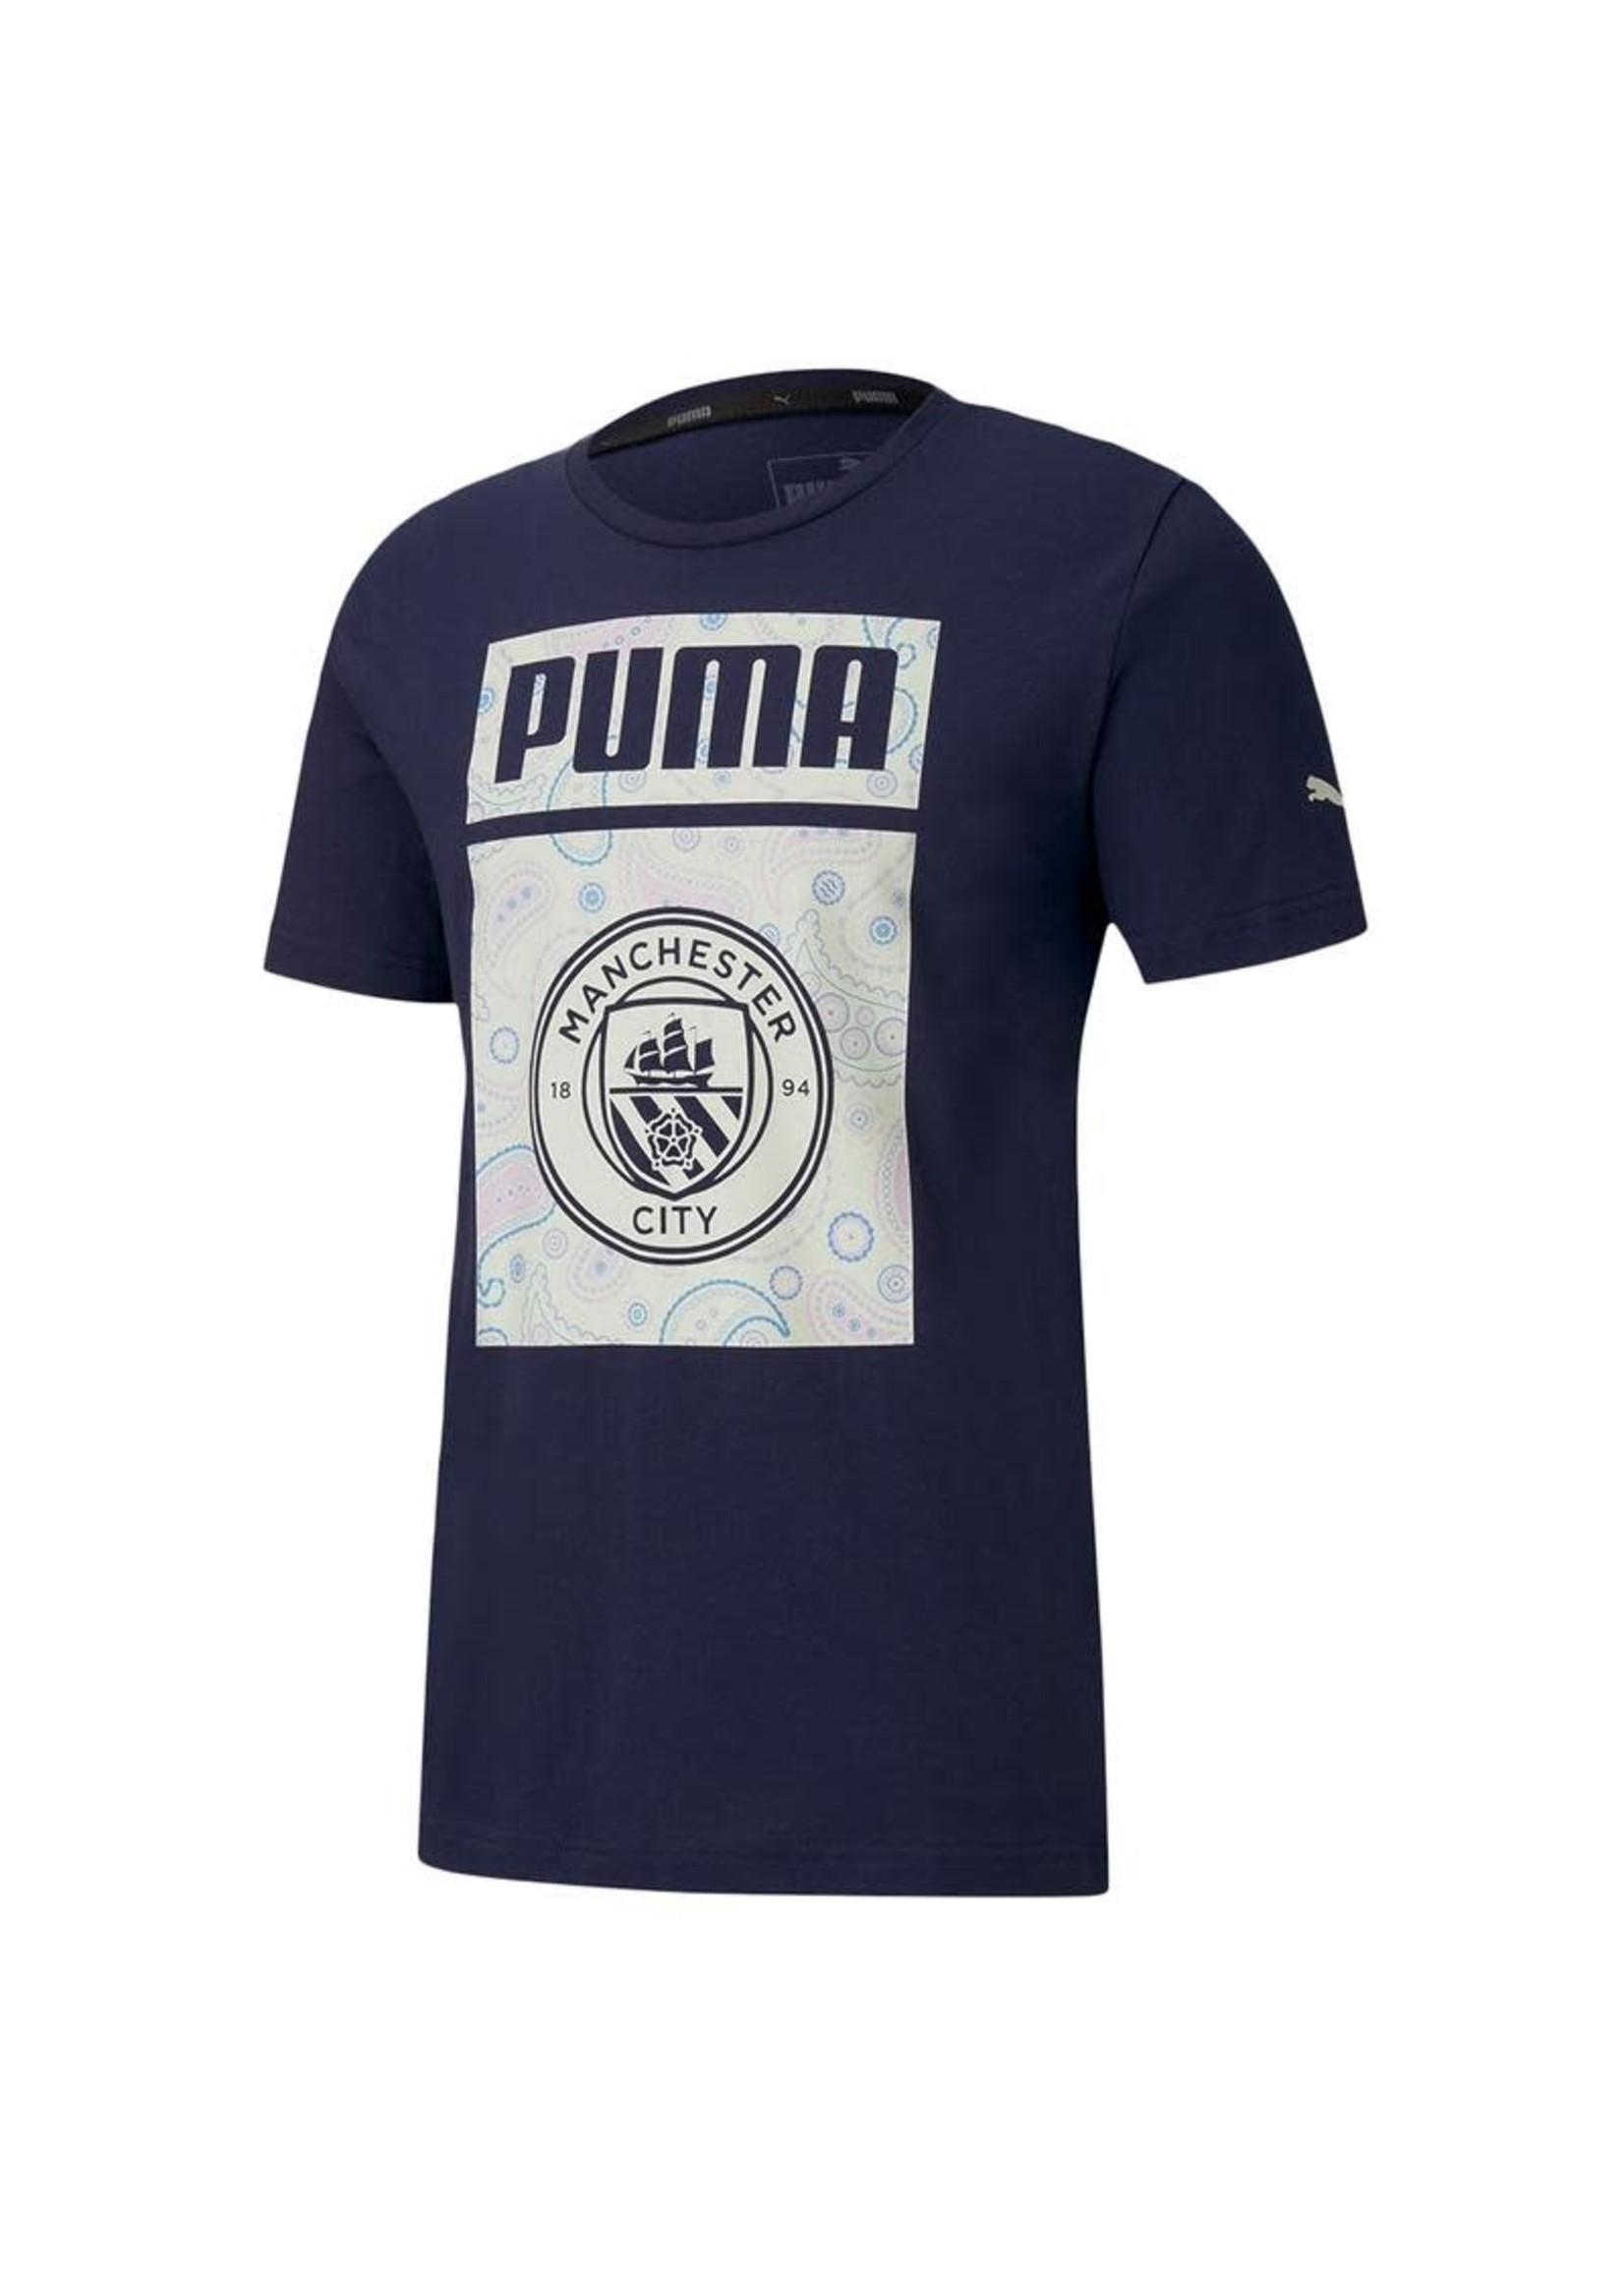 Puma Manchester City Graphic T-Shirt - 20/21 Third